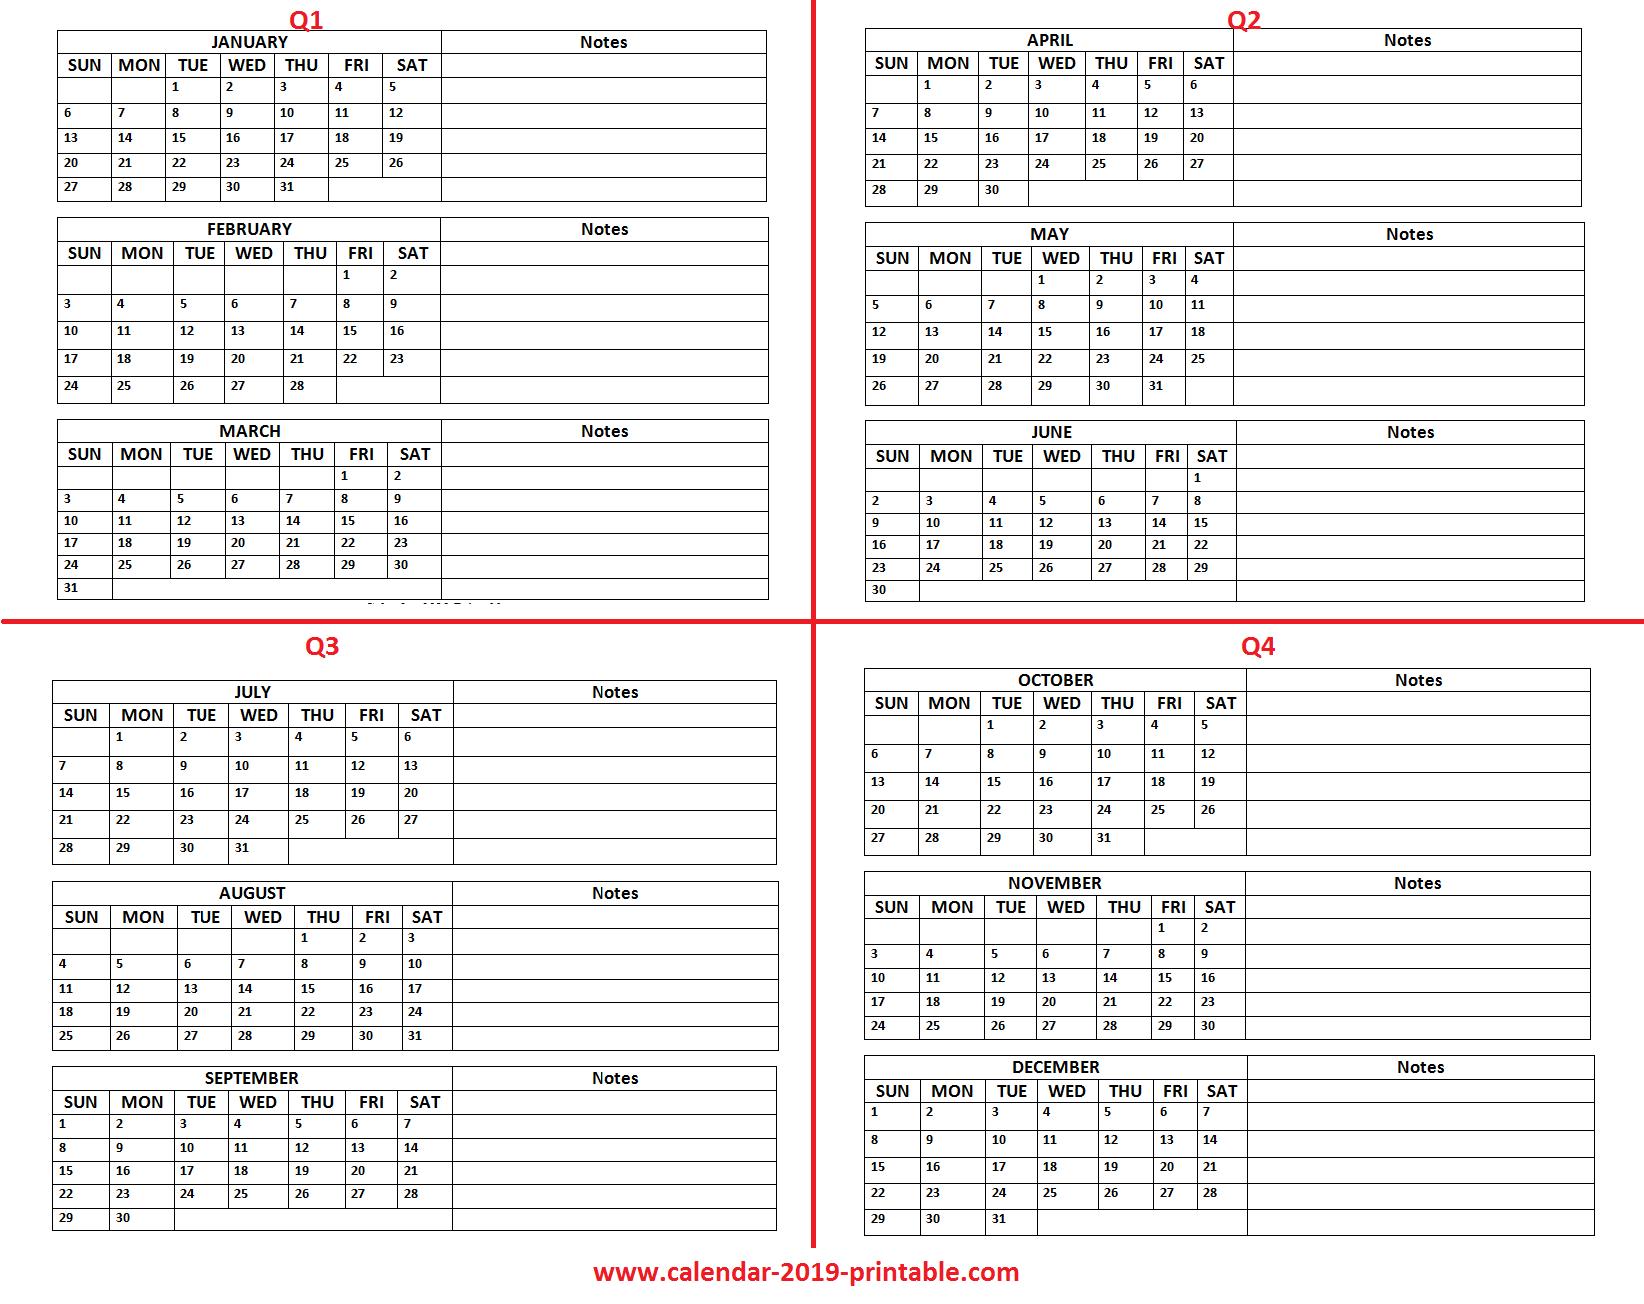 Quarter Calendar 2019 2019 quarterly calendar | 2019 Calendars | Quarterly calendar